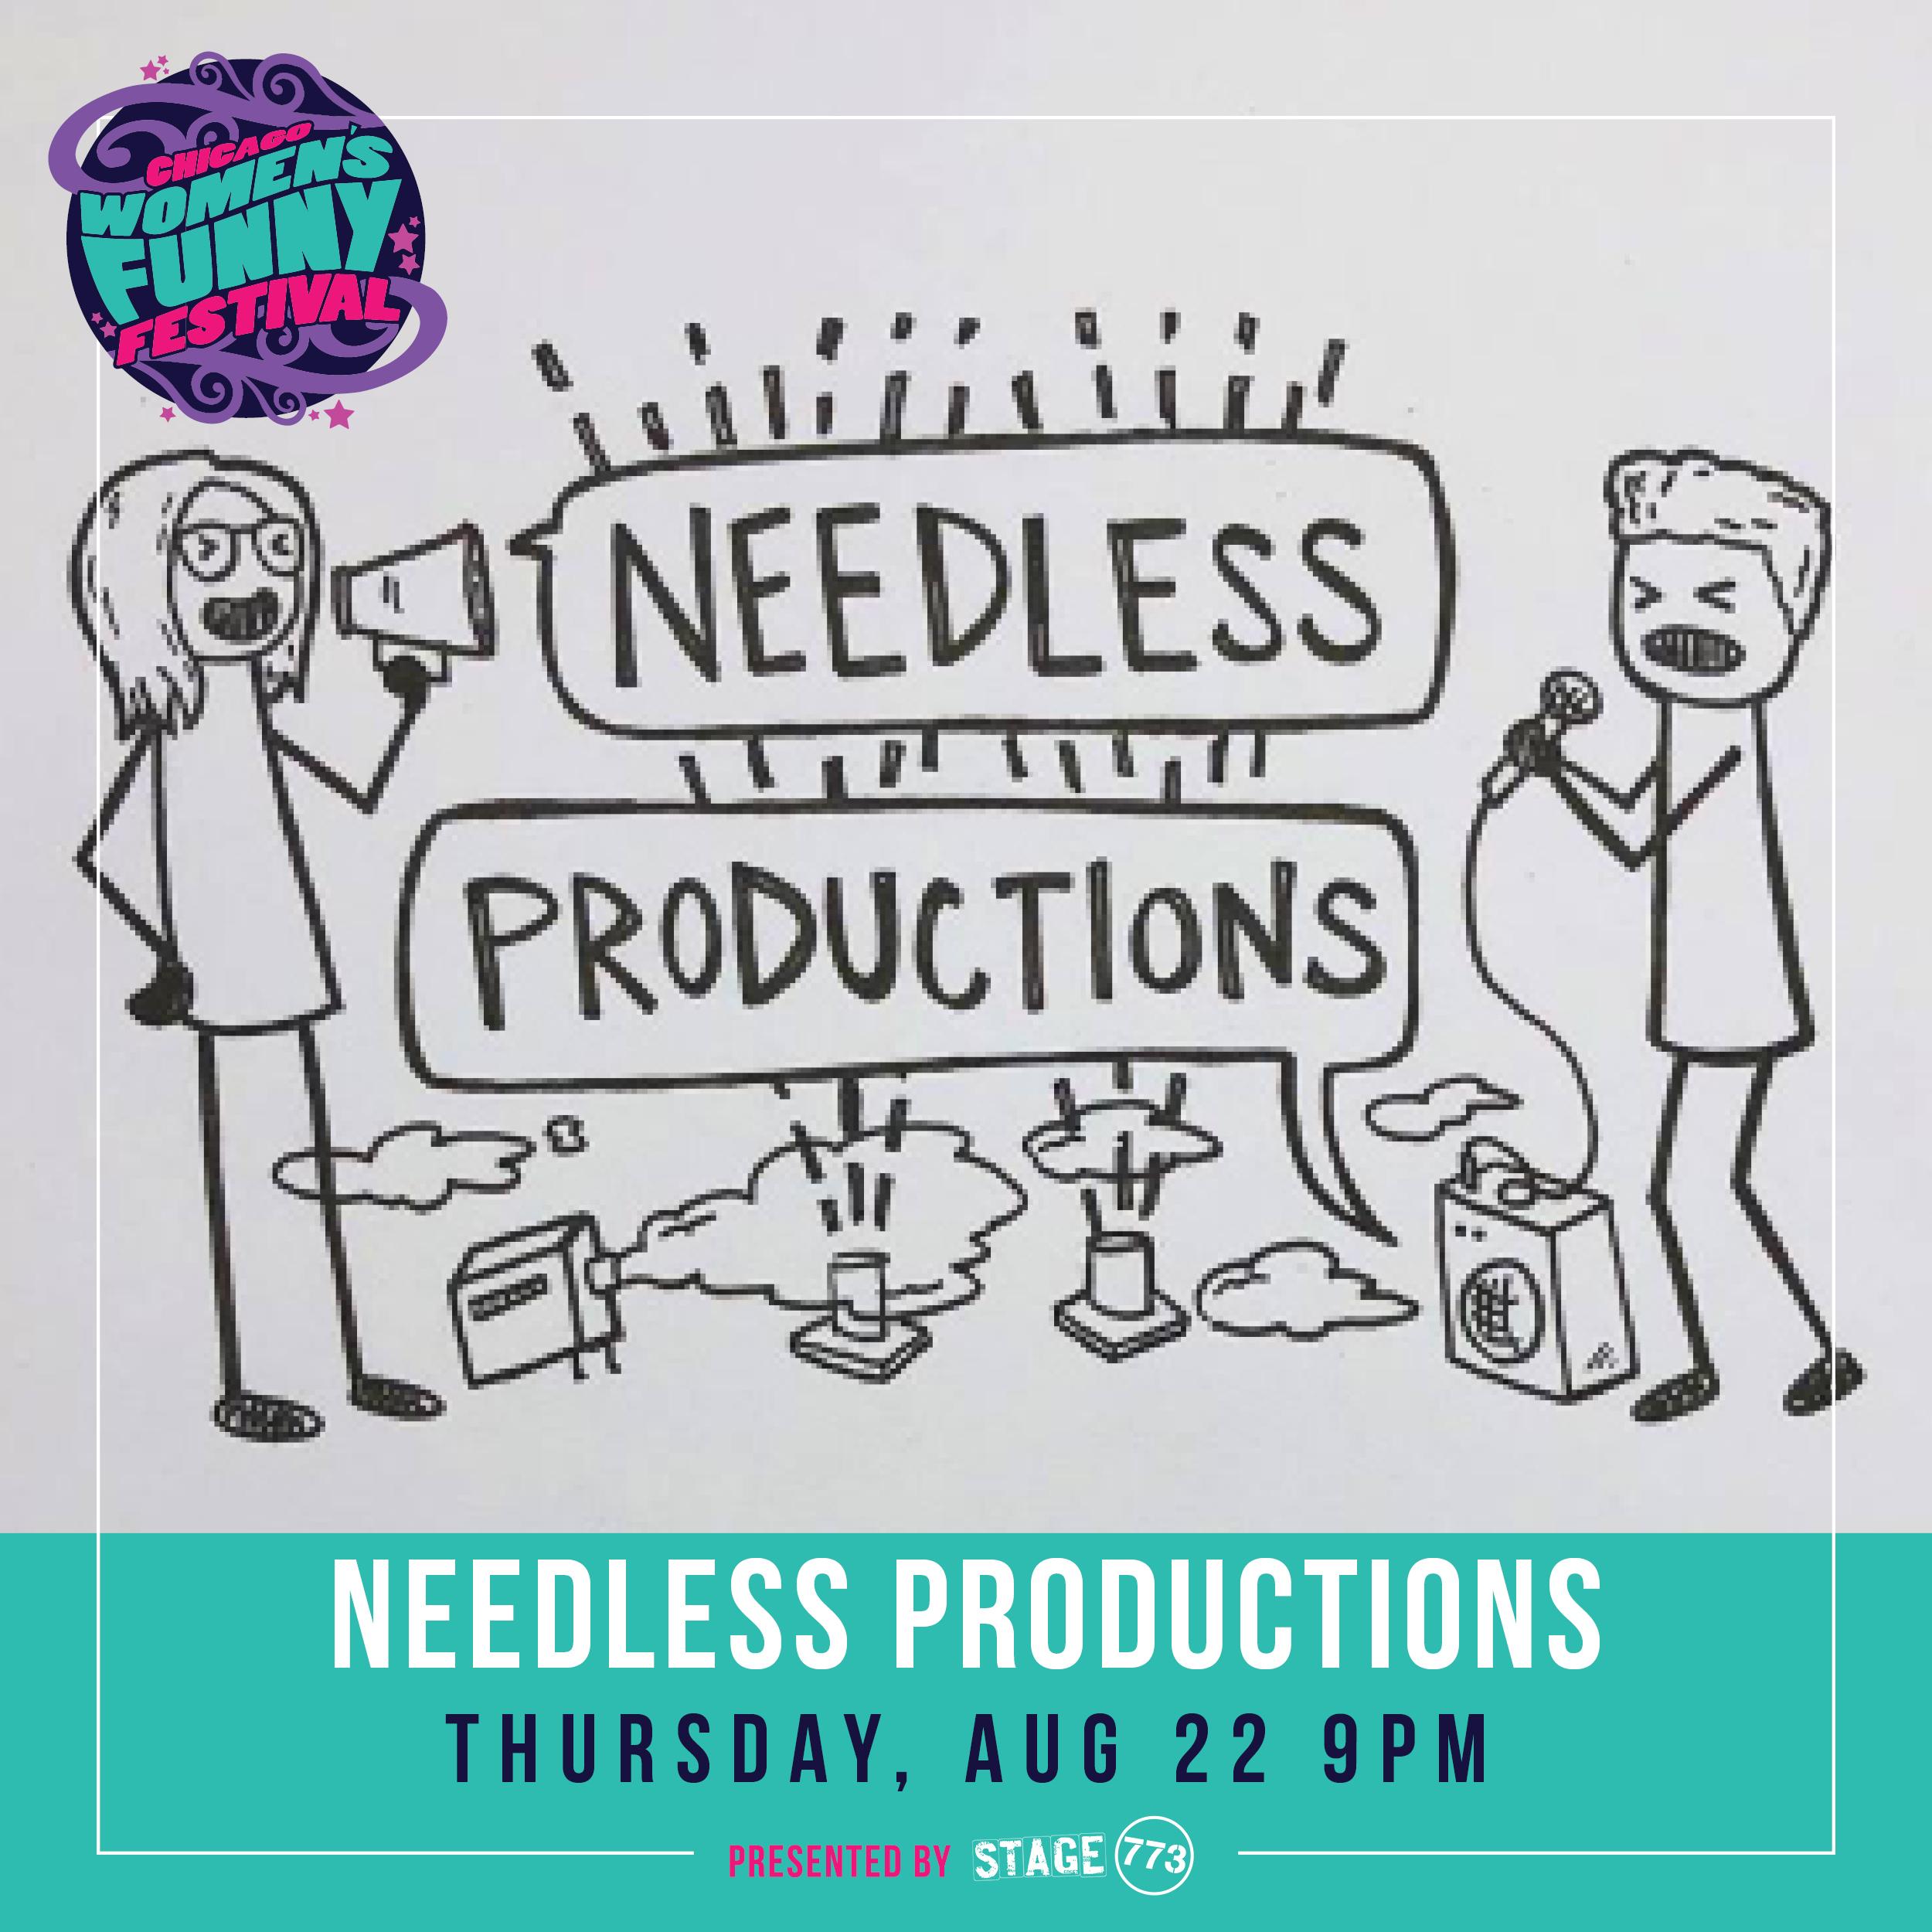 NeedlessProductions_Thursday_9PM_CWFF20197.jpg